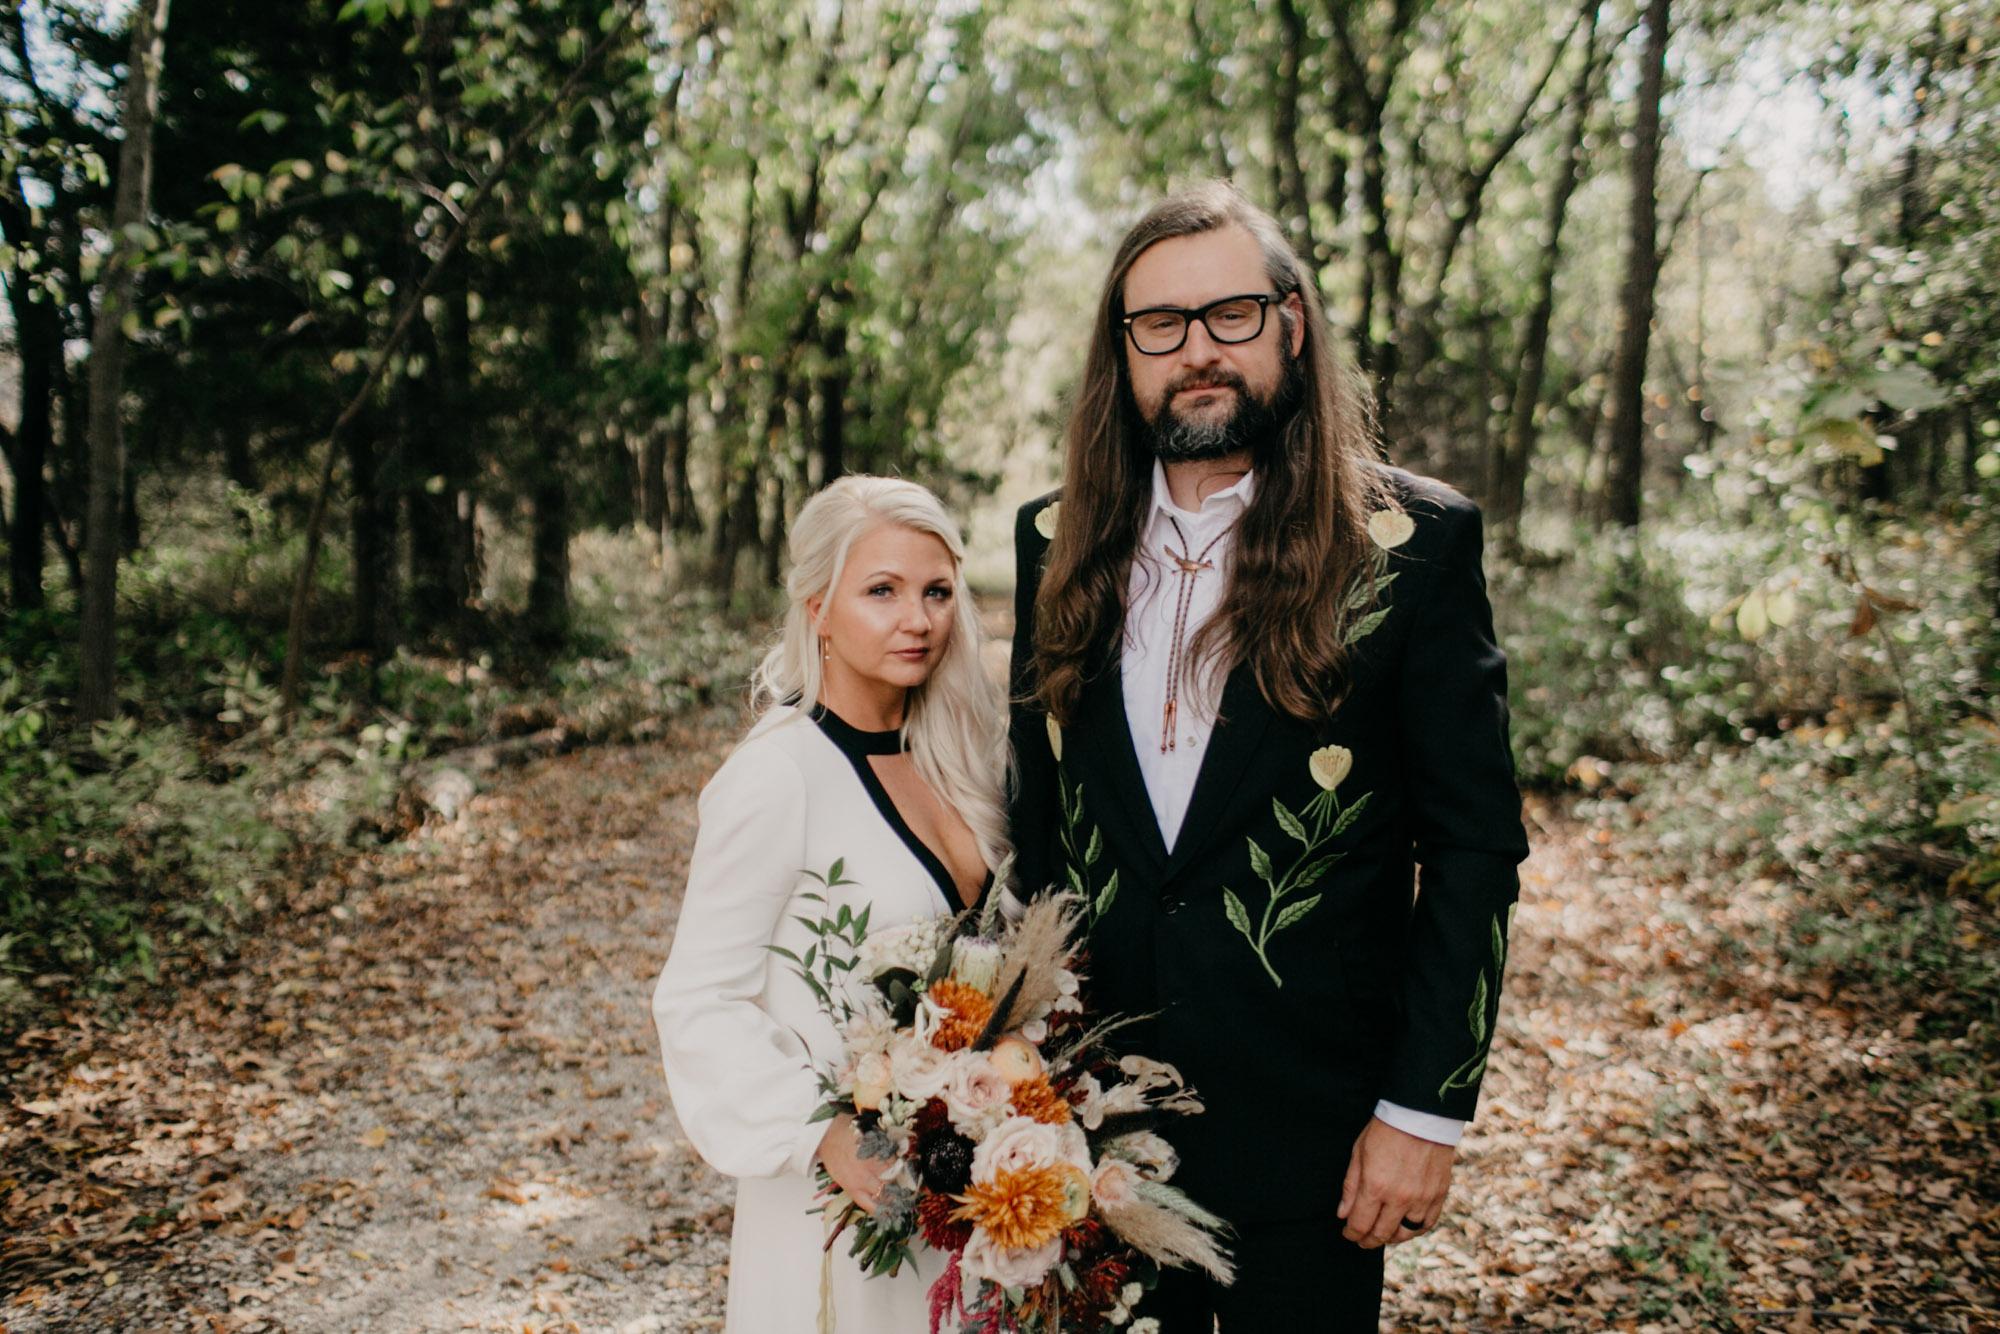 kansas-city-wedding-photographer-7.jpg